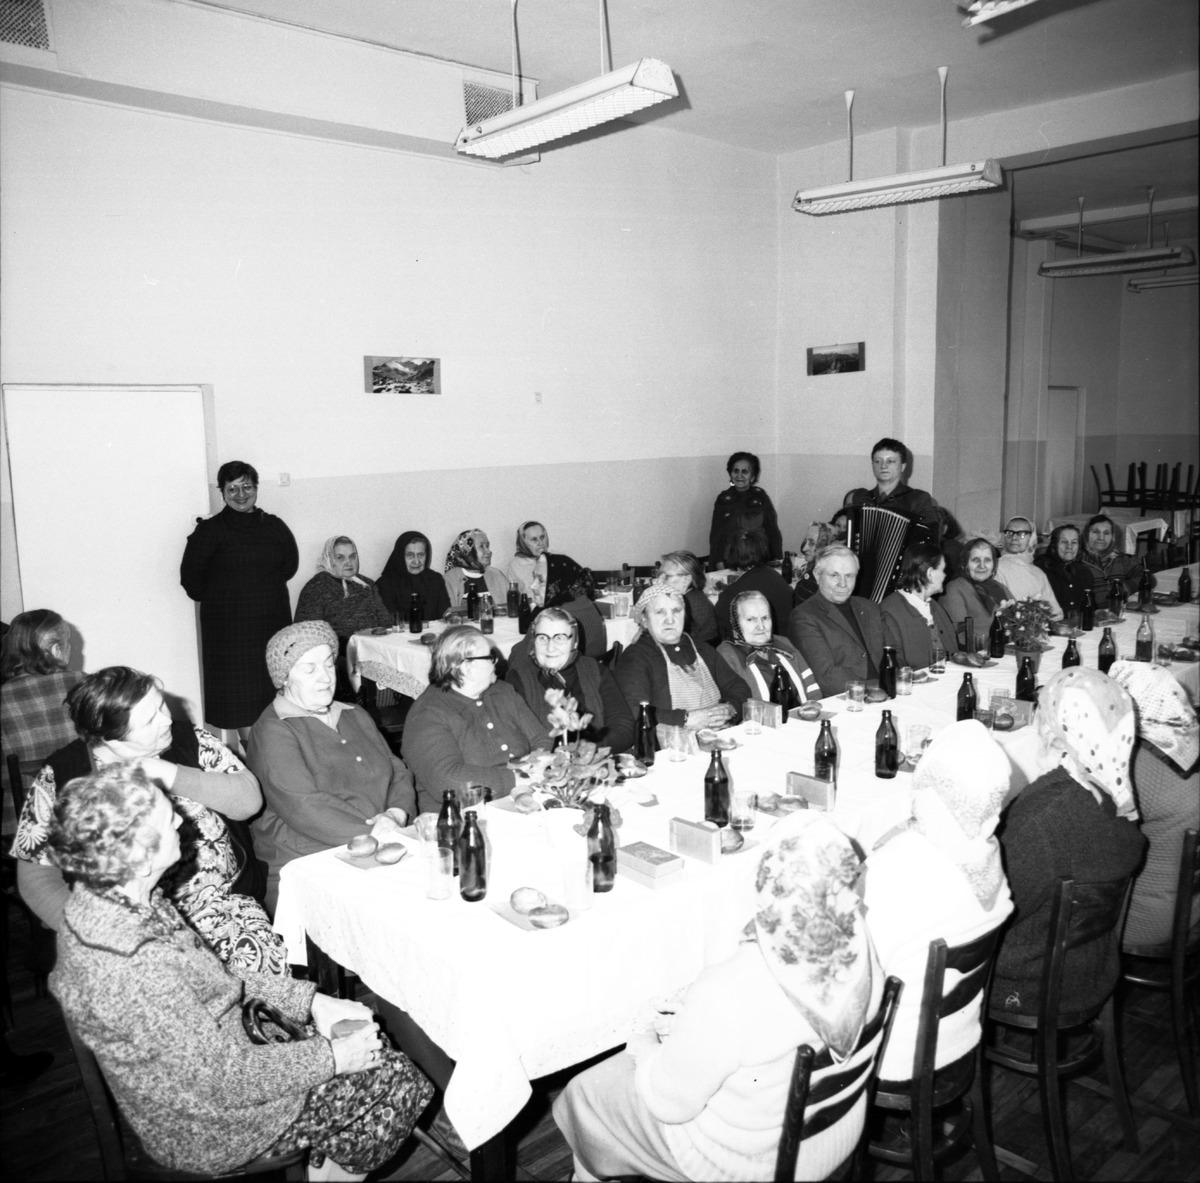 Obchody Dnia Seniora, 1986 r. [5]